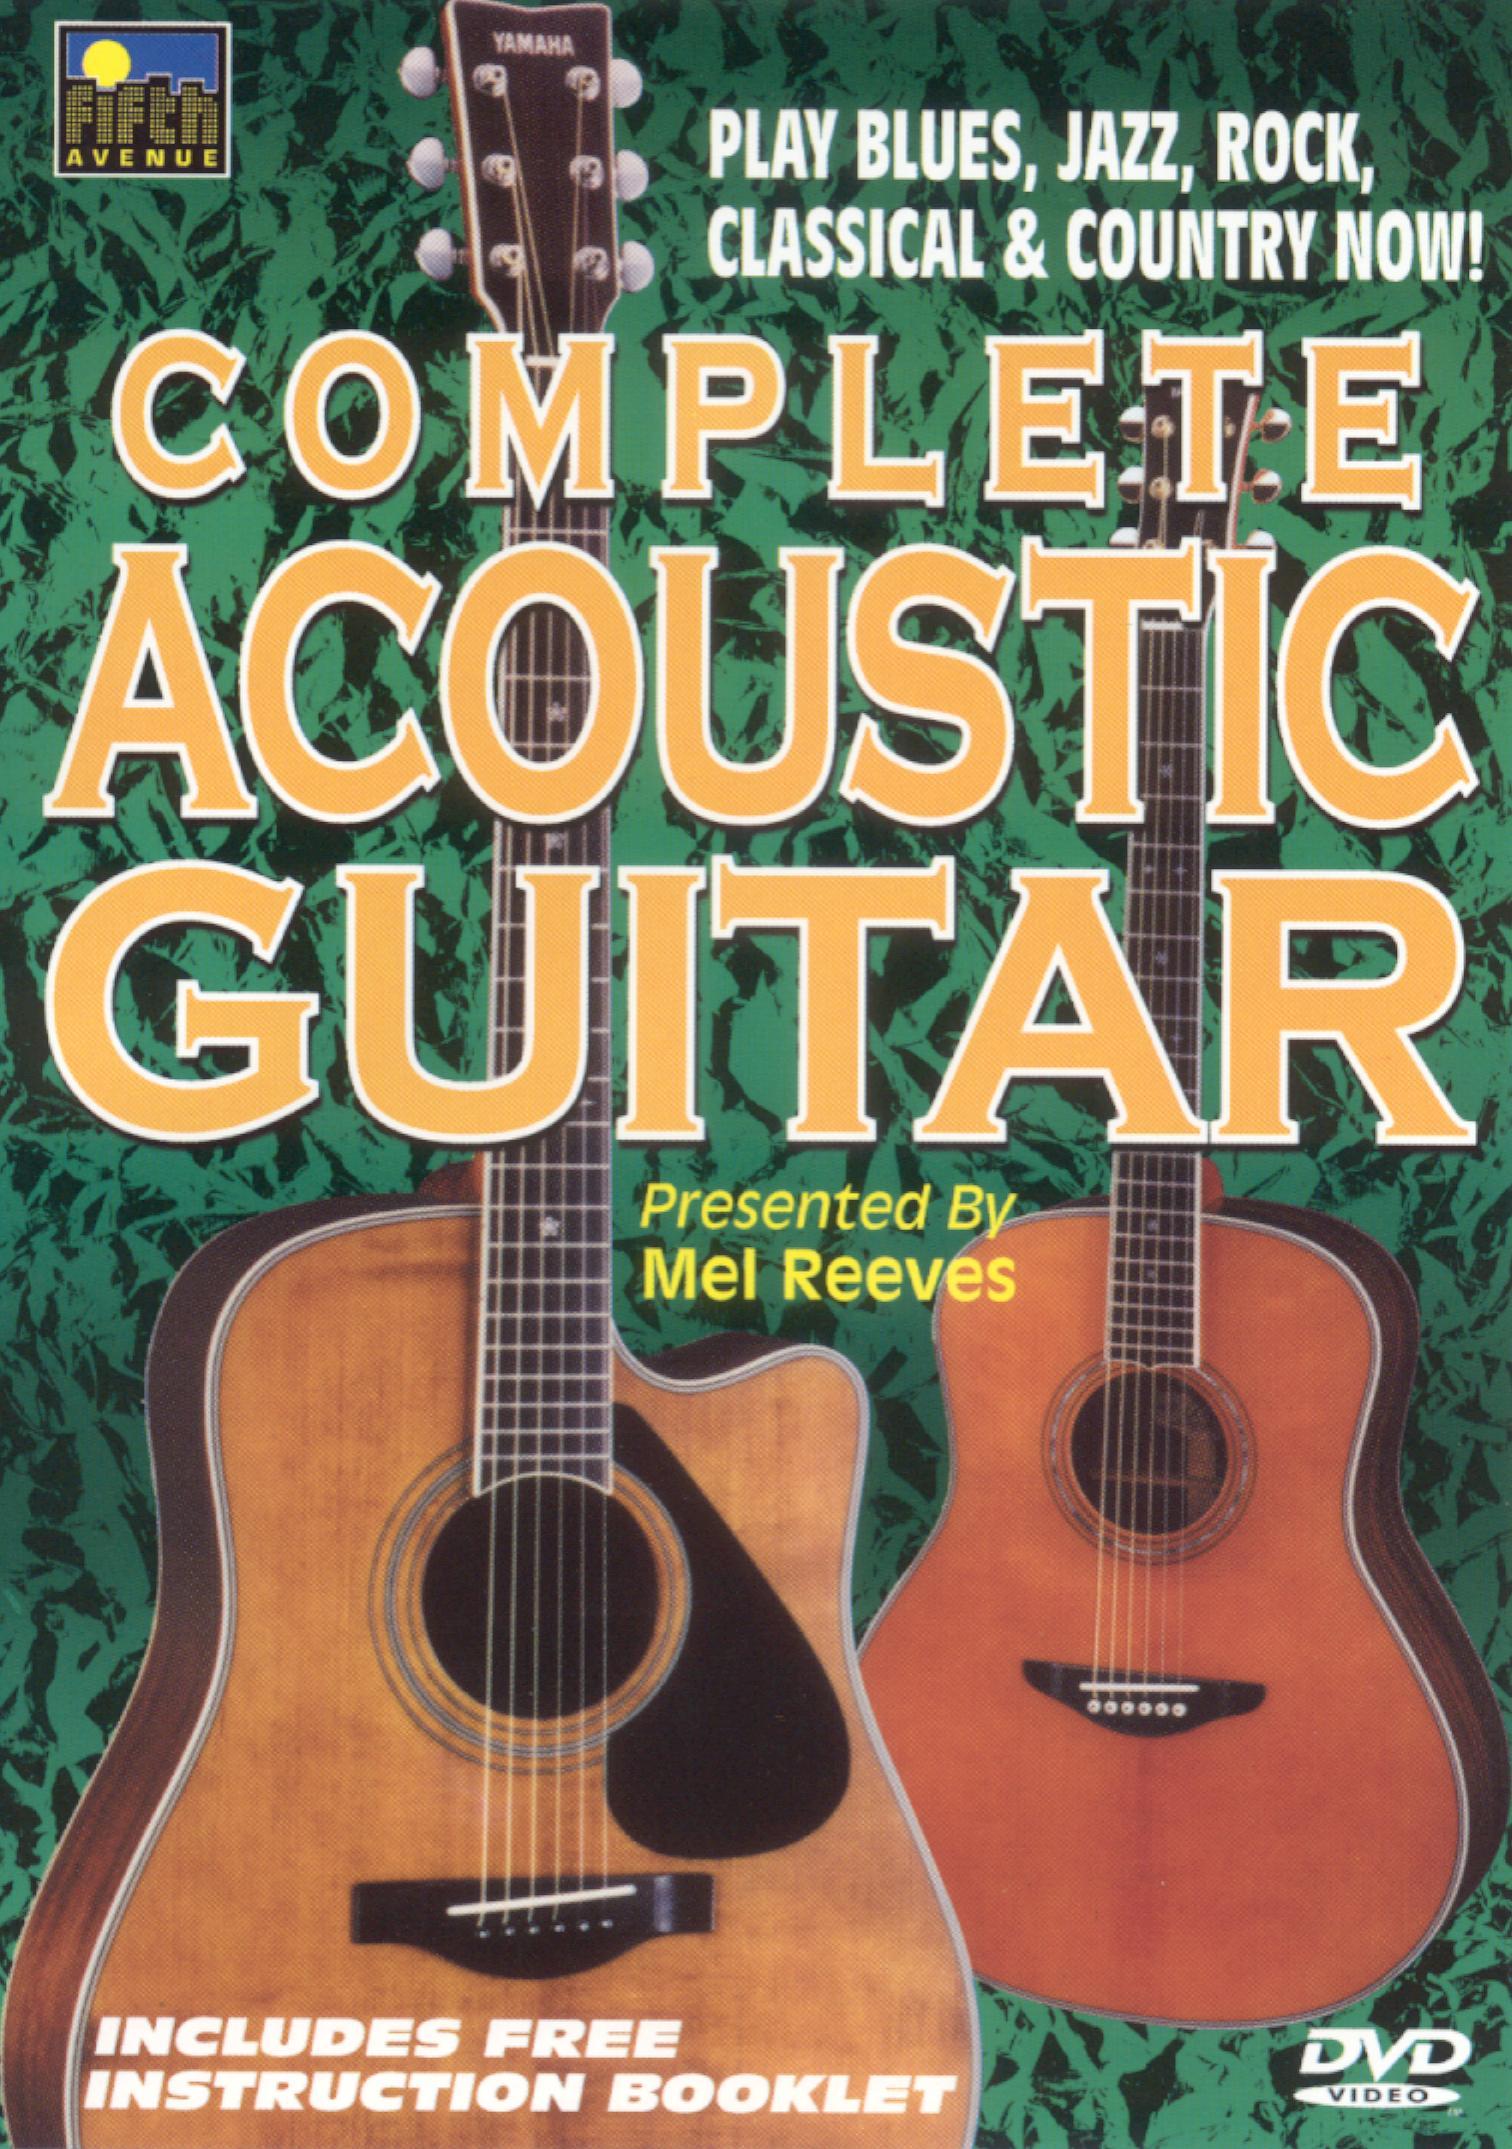 Complete Acoustic Guitar